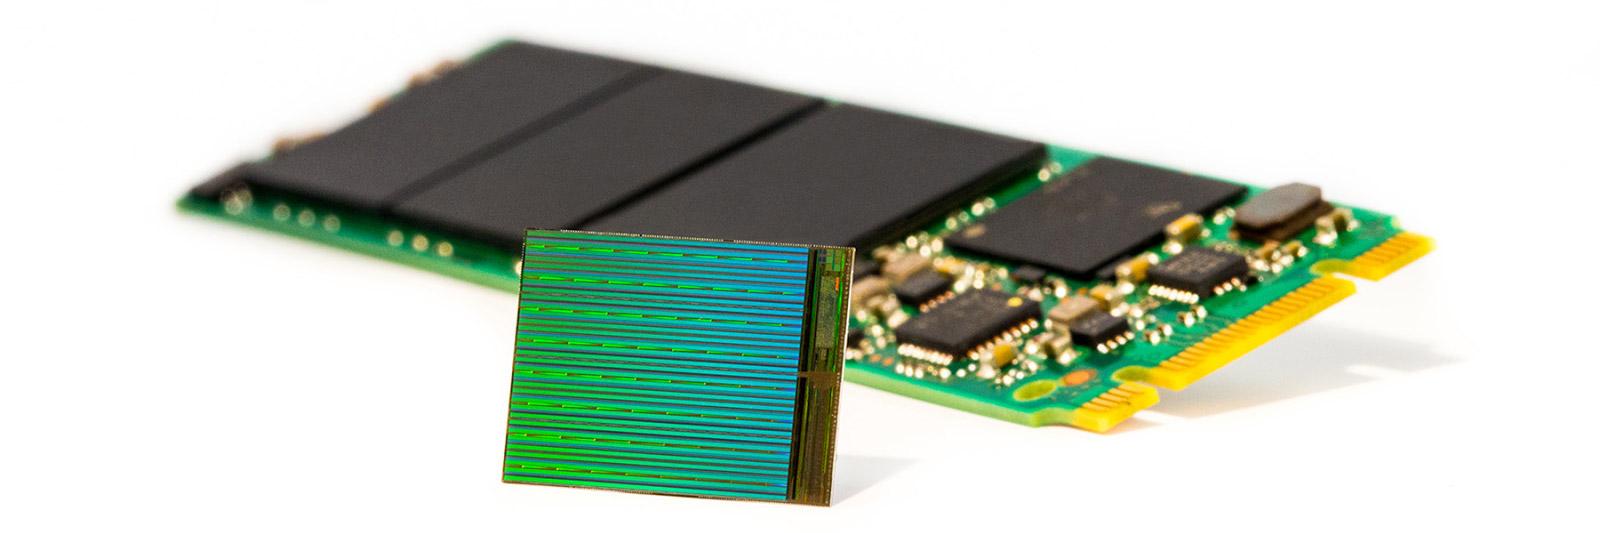 SanDisk BiCS 3D NAND3